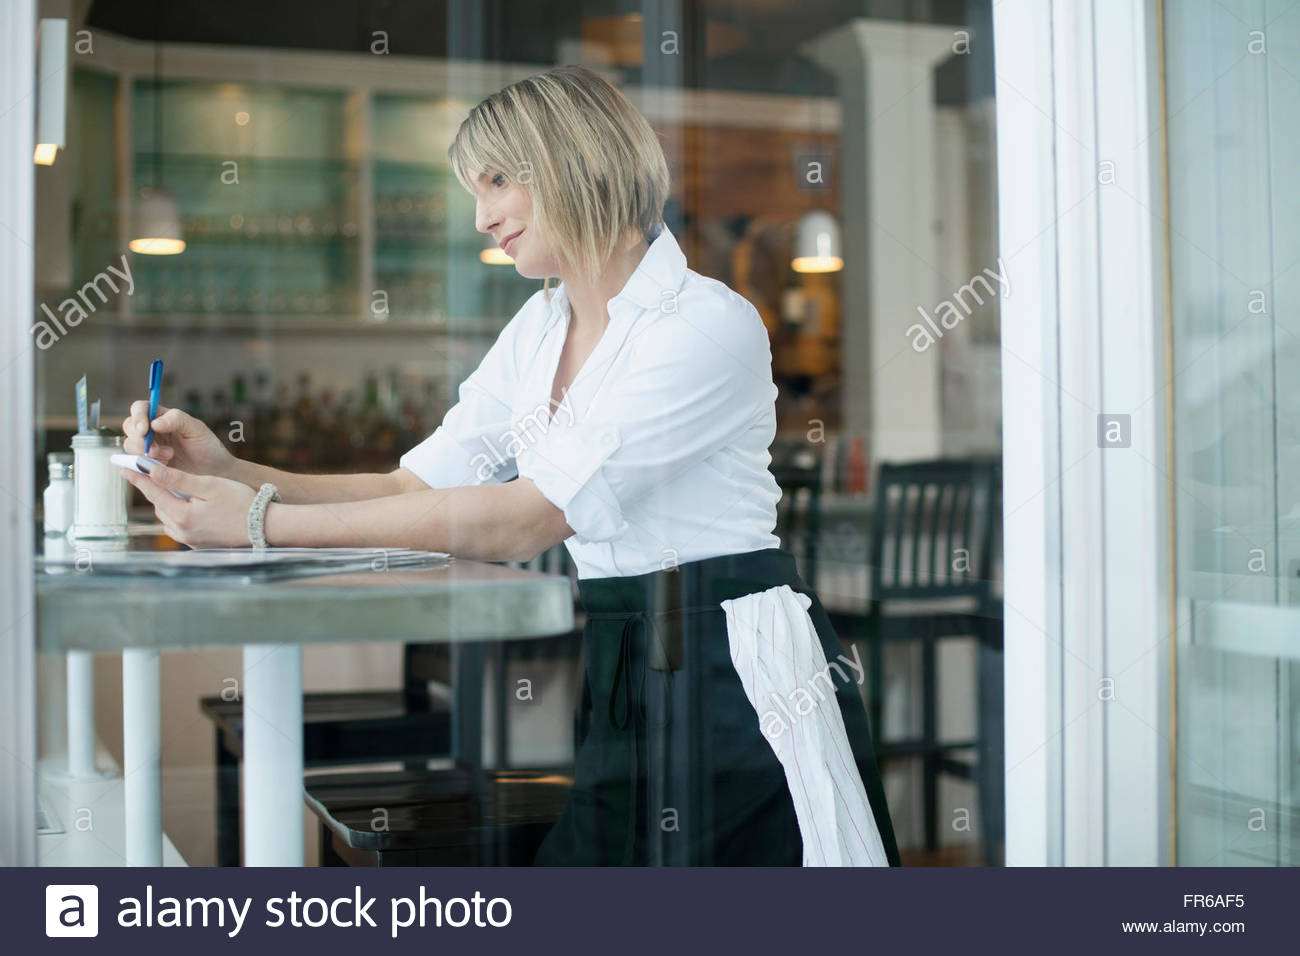 Restaurant Calculation Imágenes De Stock & Restaurant Calculation ...